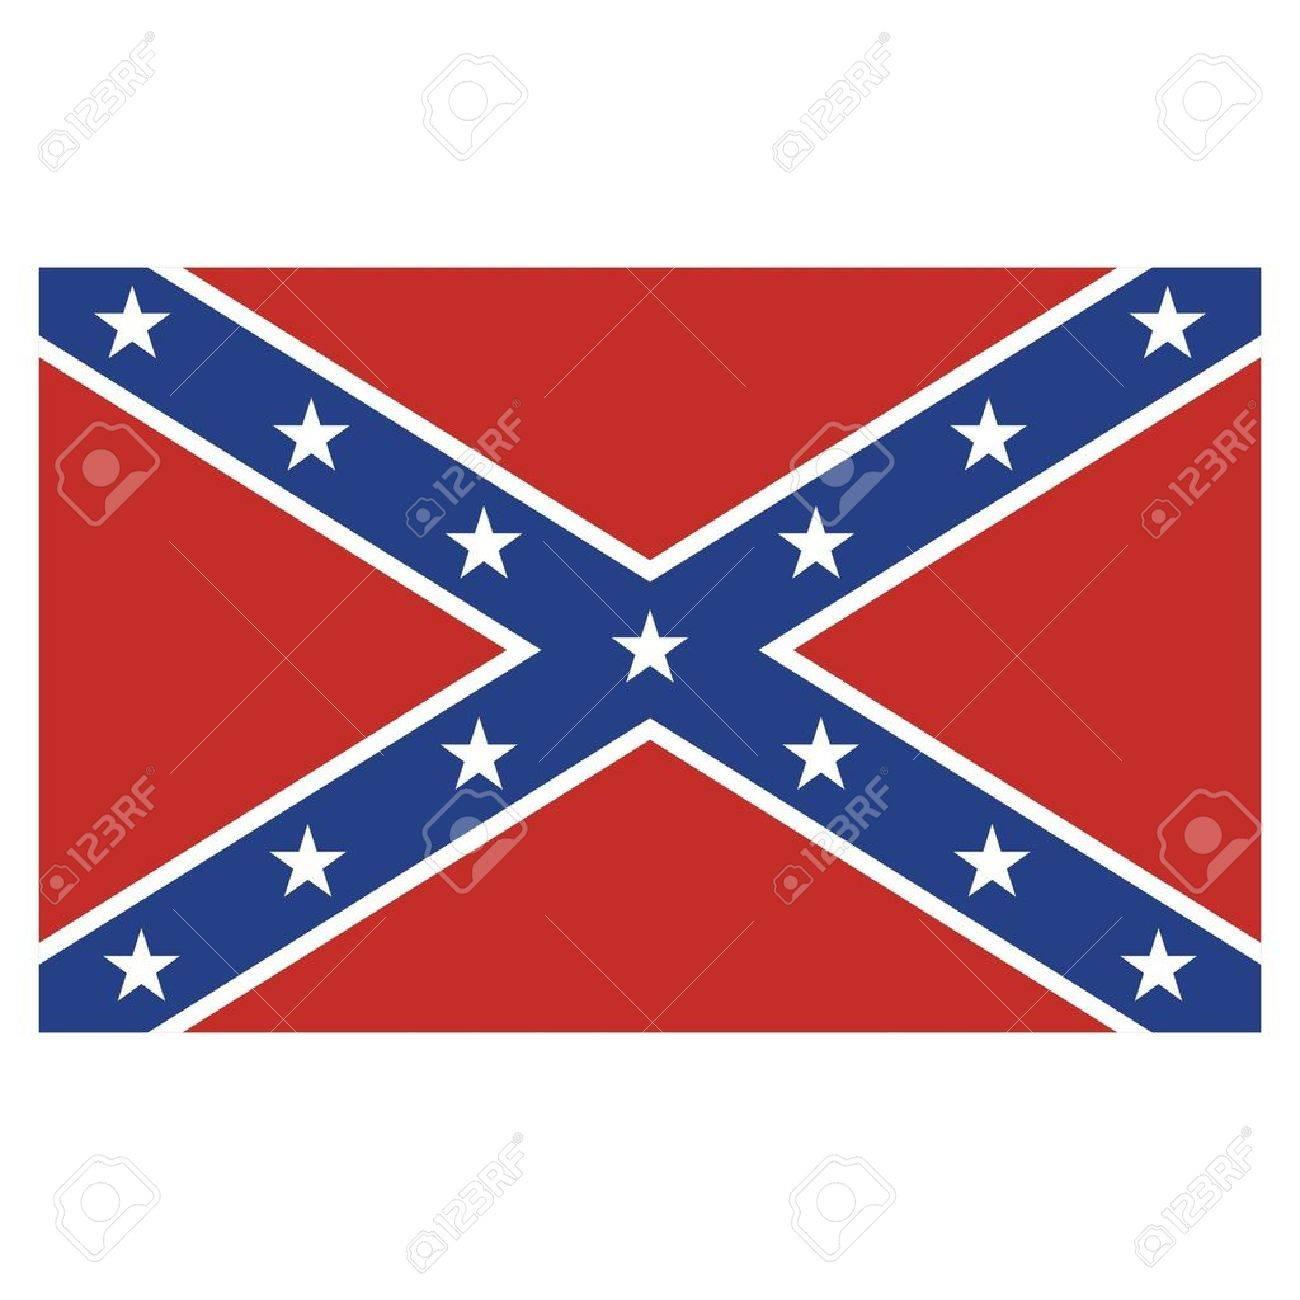 Confederate Rebel Flag Stock Vector - 24811471